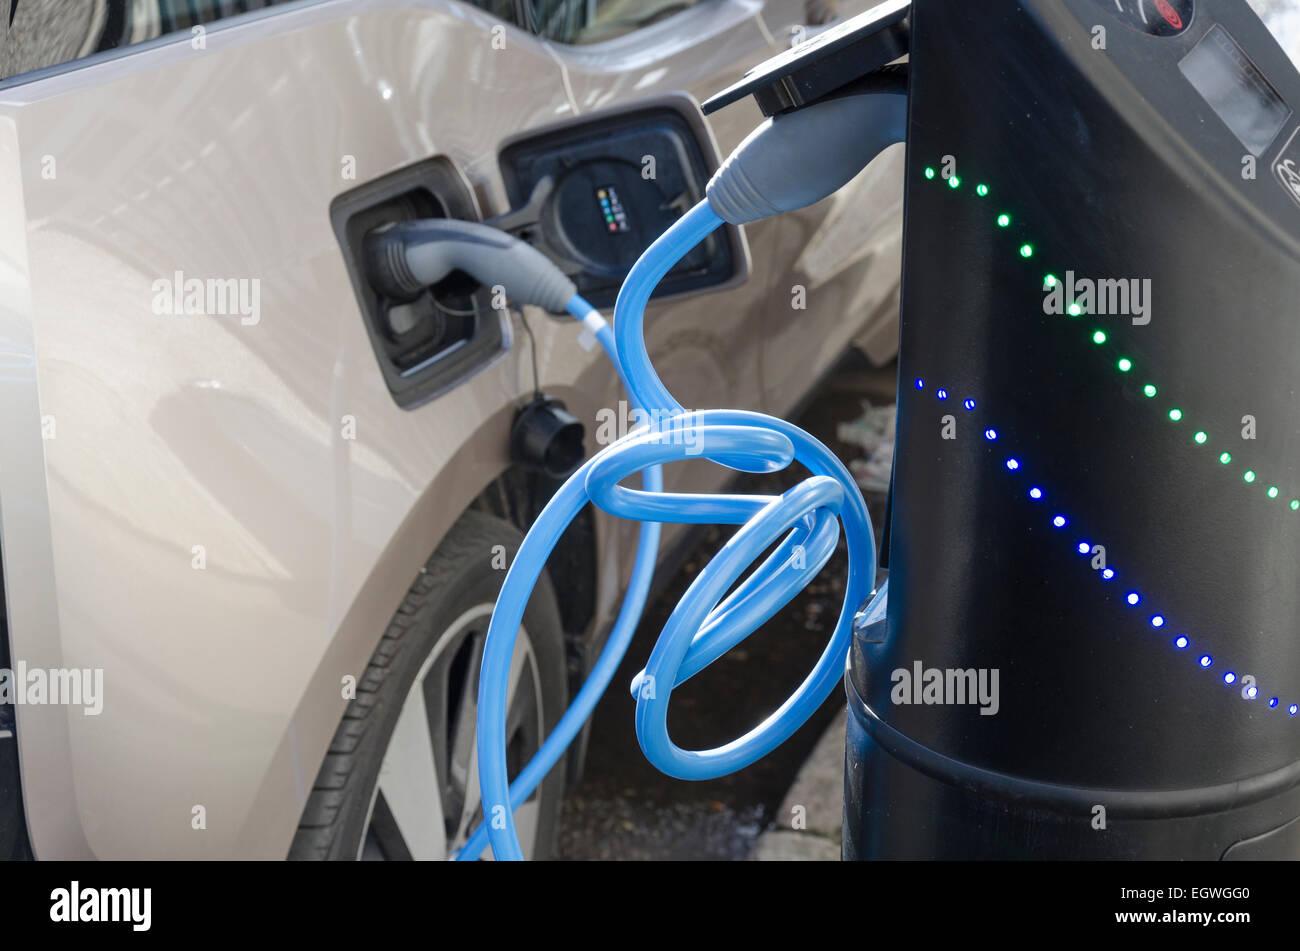 Electric car electric vehicle on-street charging. London, UK - Stock Image